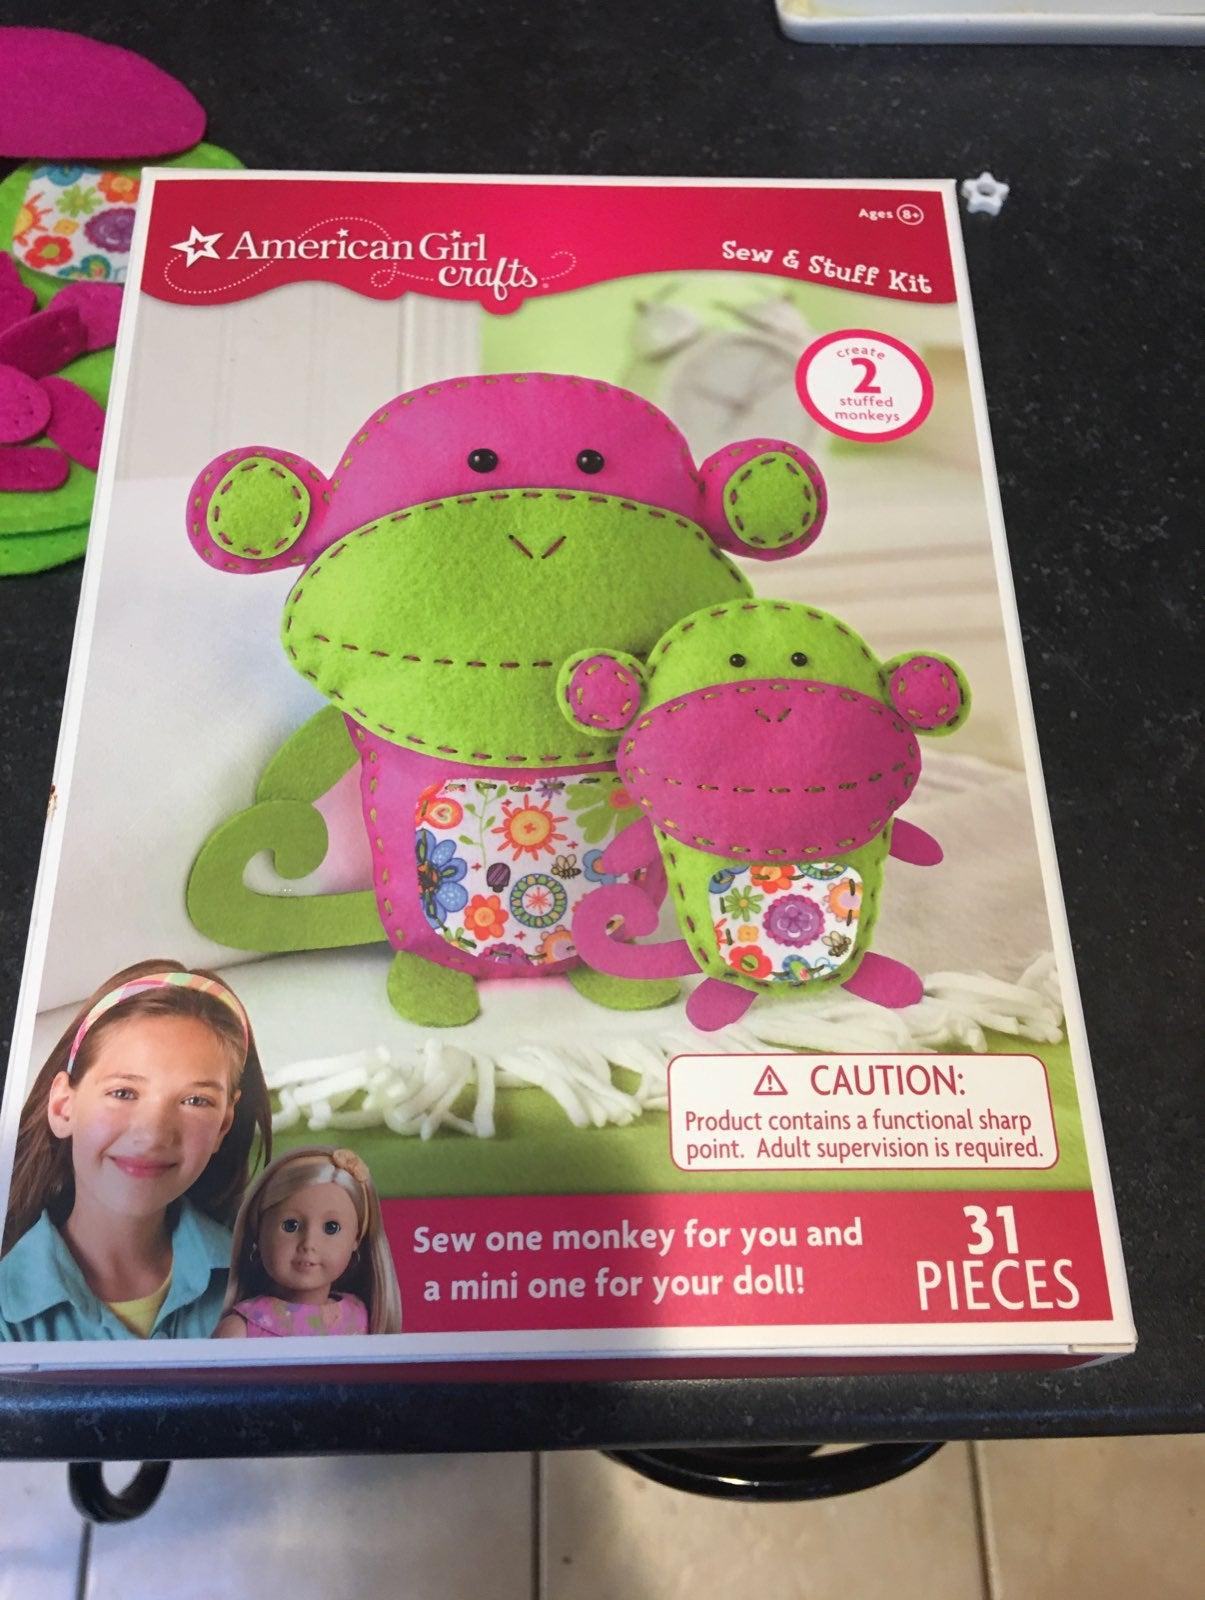 American Girl Crafts - 2 stuffed monkeys